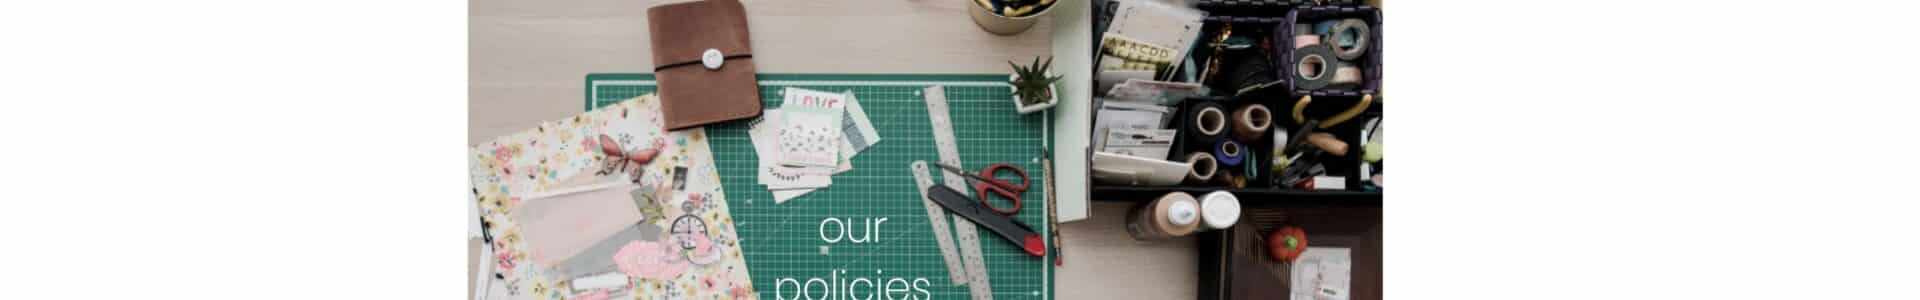 synergy craft studio policies